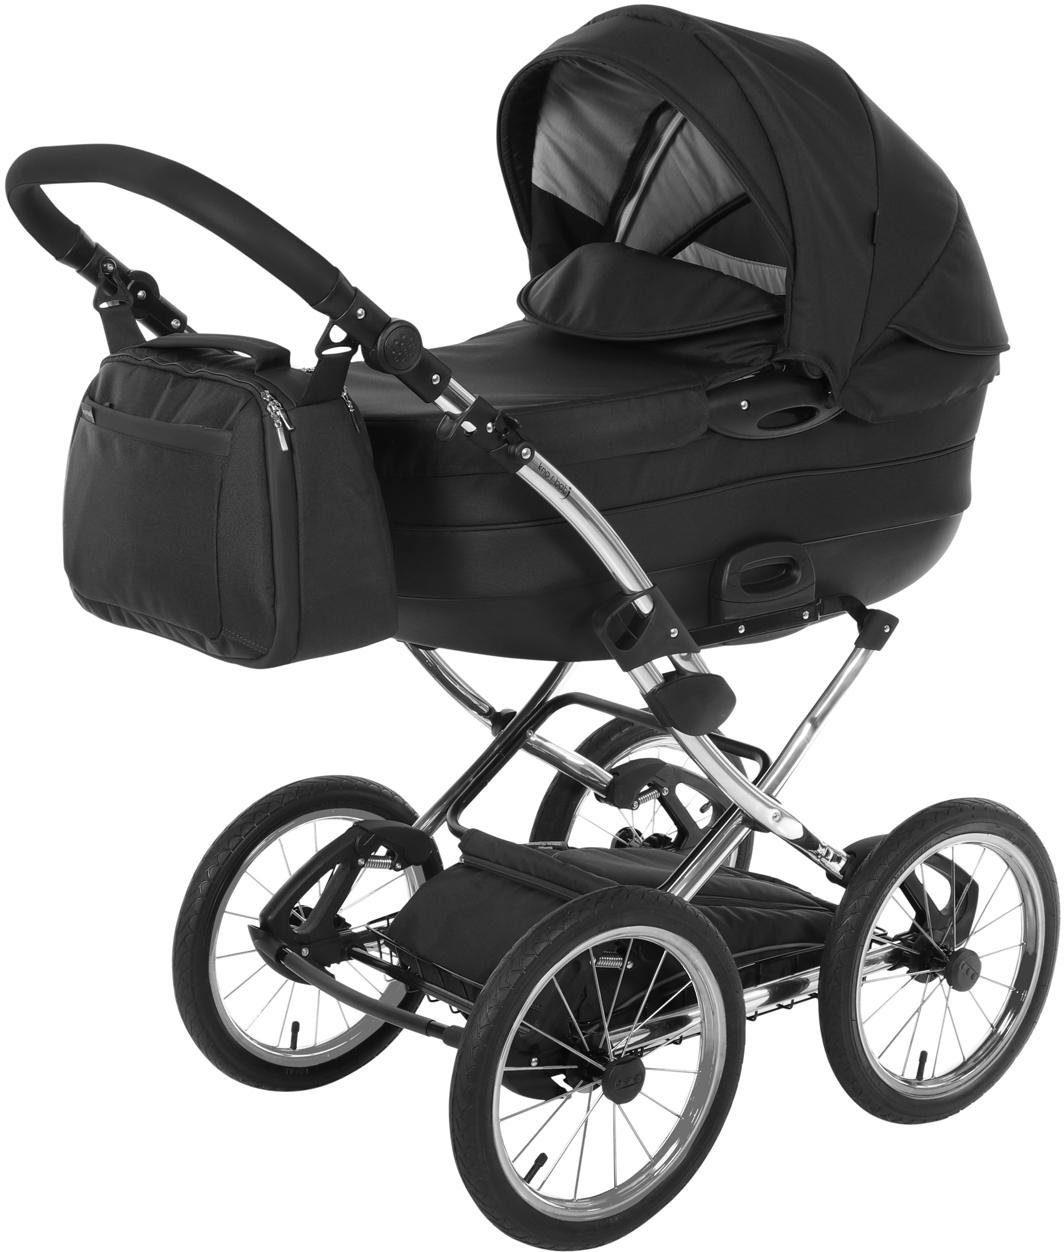 knorr-baby Kombi-Kinderwagen, »Precioso, schwarz«